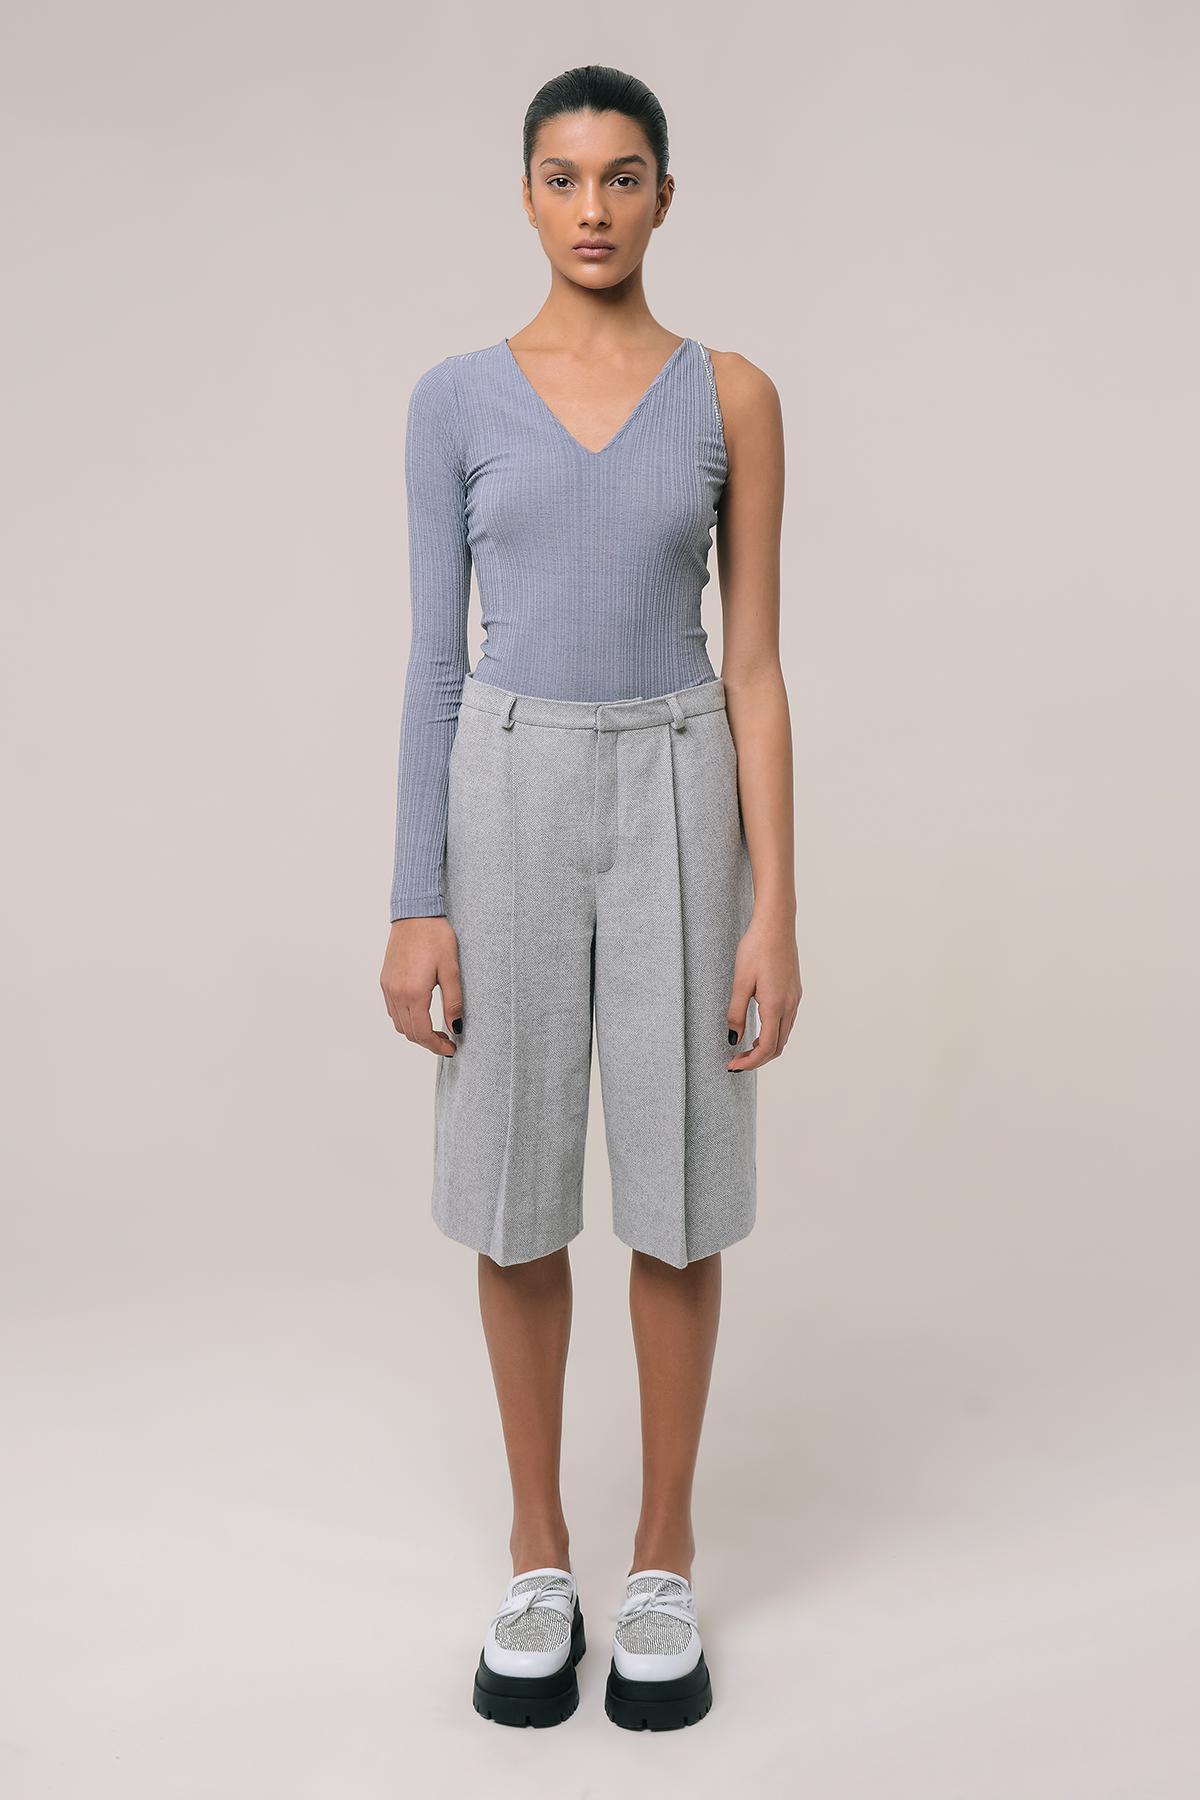 High waisted tweed shorts